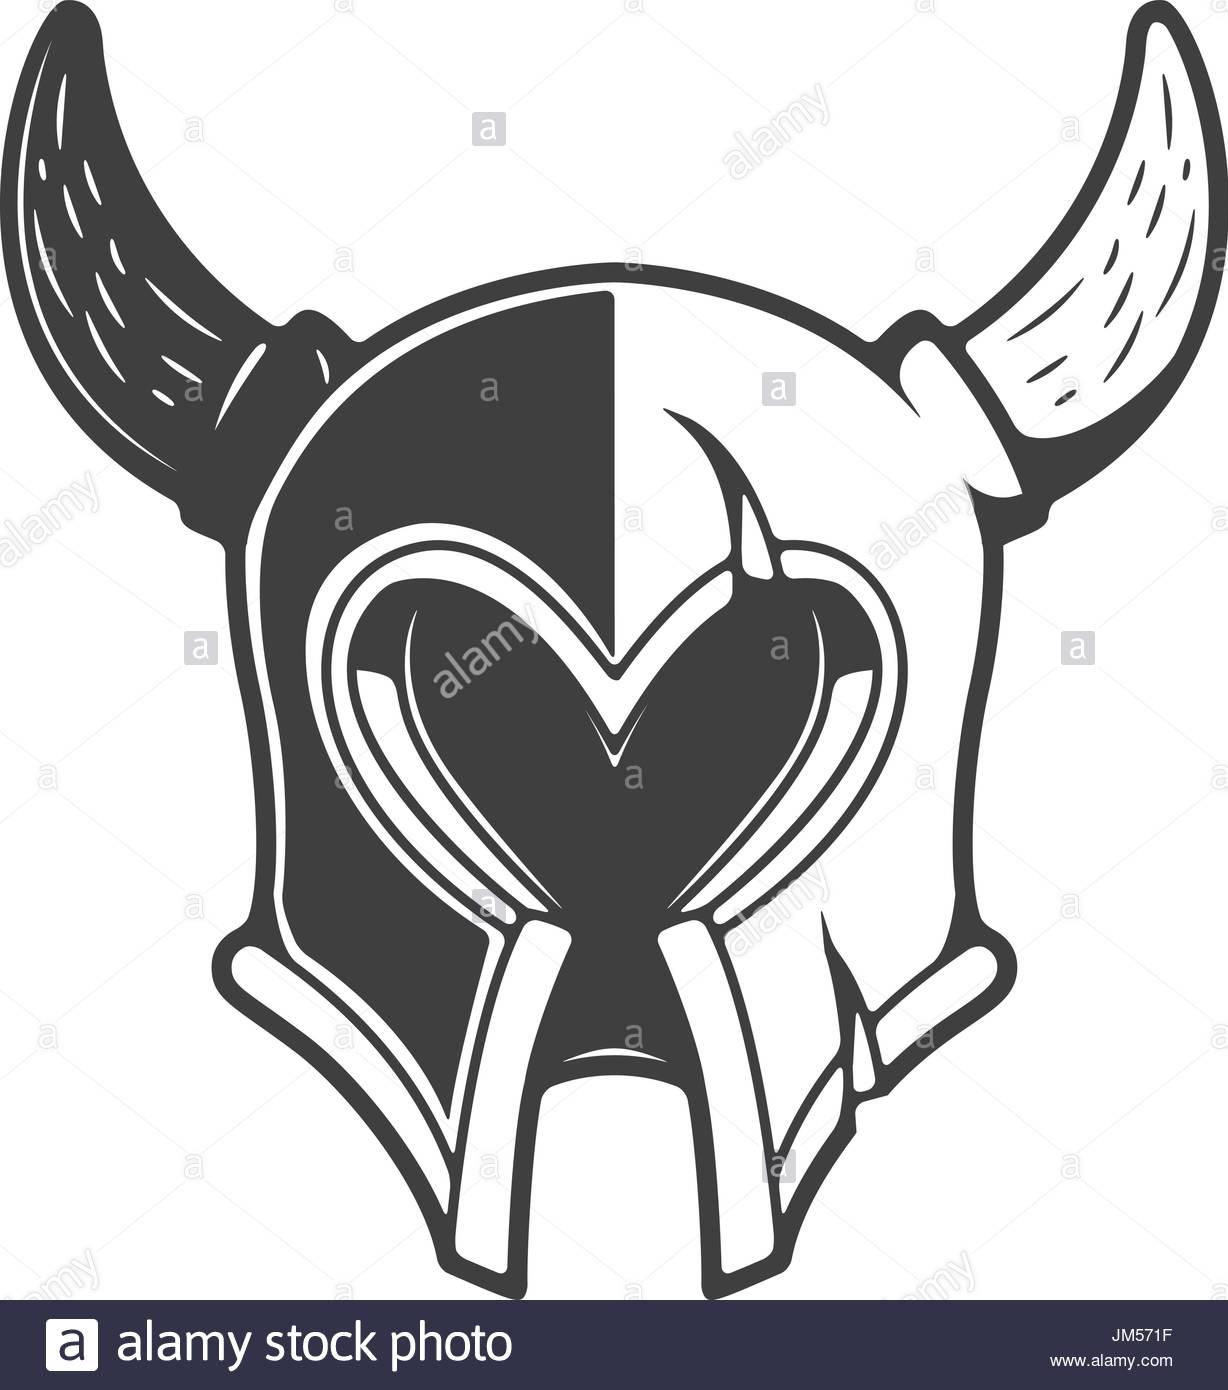 1228x1390 Viking Helmet Isolated On White Background. Design Element